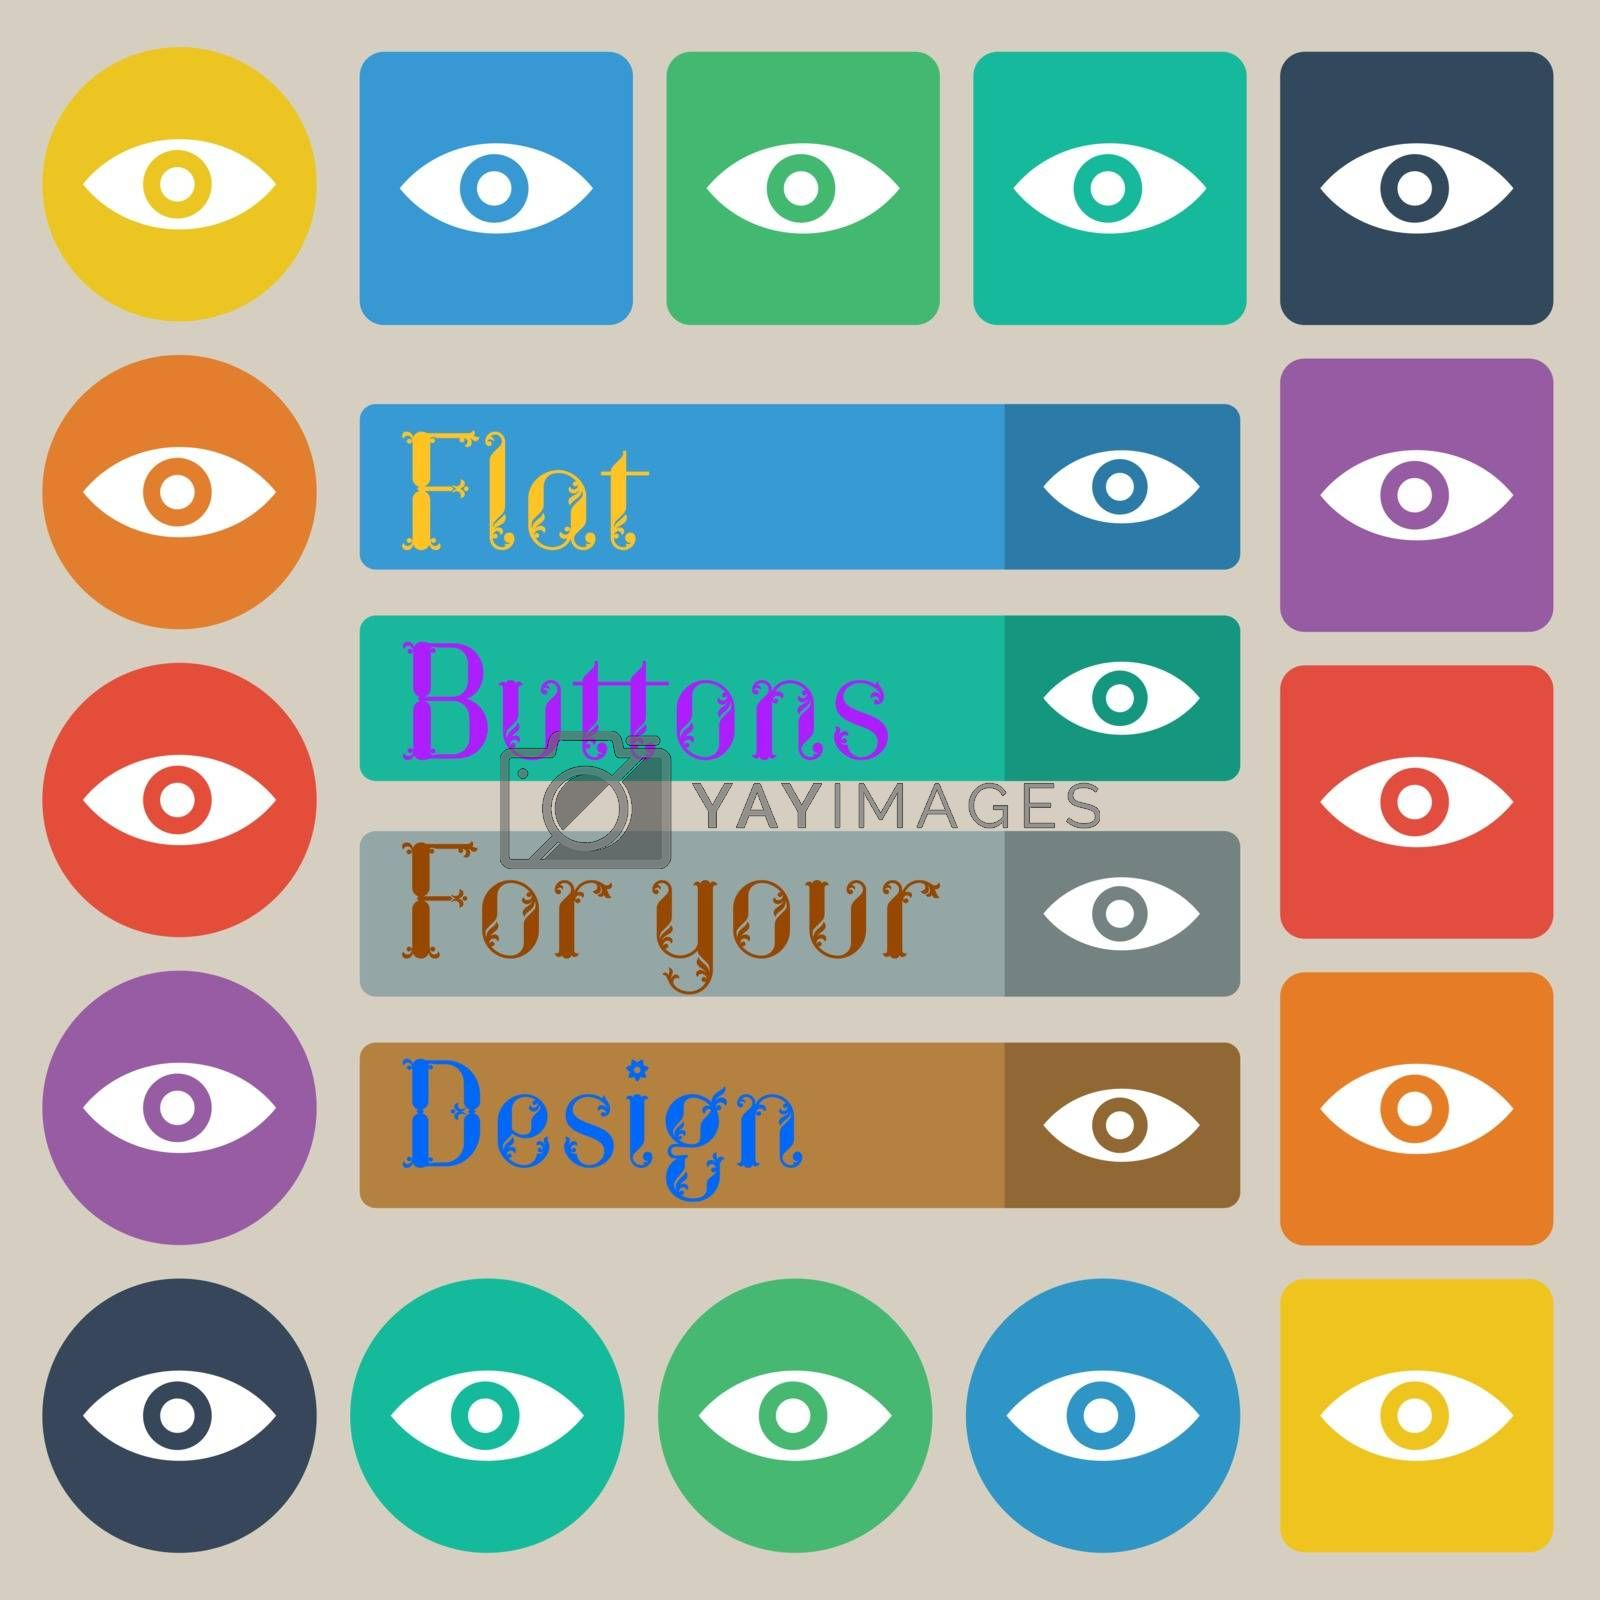 Royalty free image of Eye, Publish content, sixth sense, intuition  by serhii_lohvyniuk